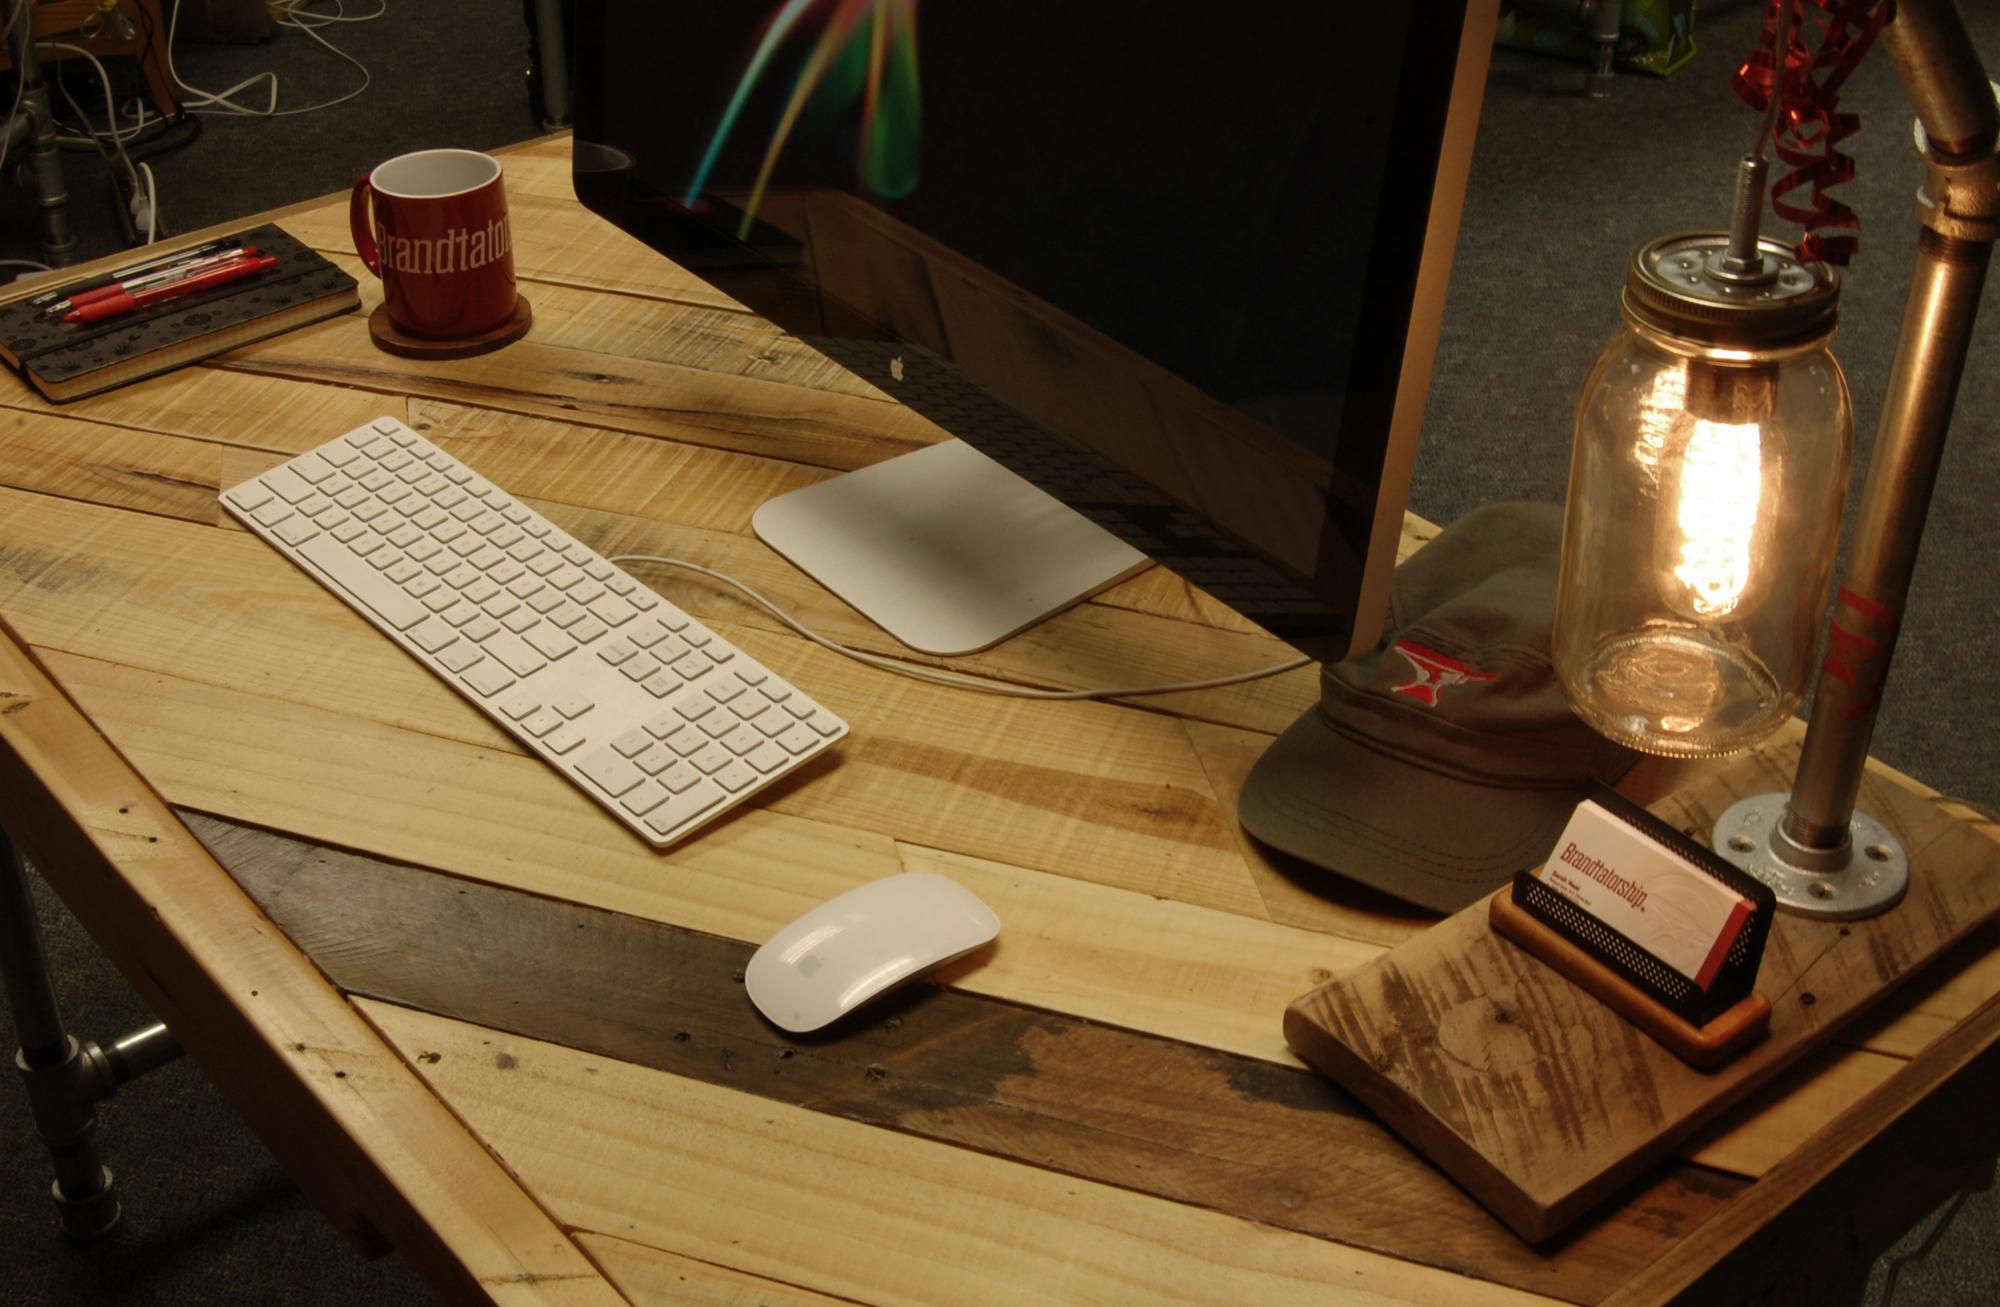 BT_Desk2.jpg